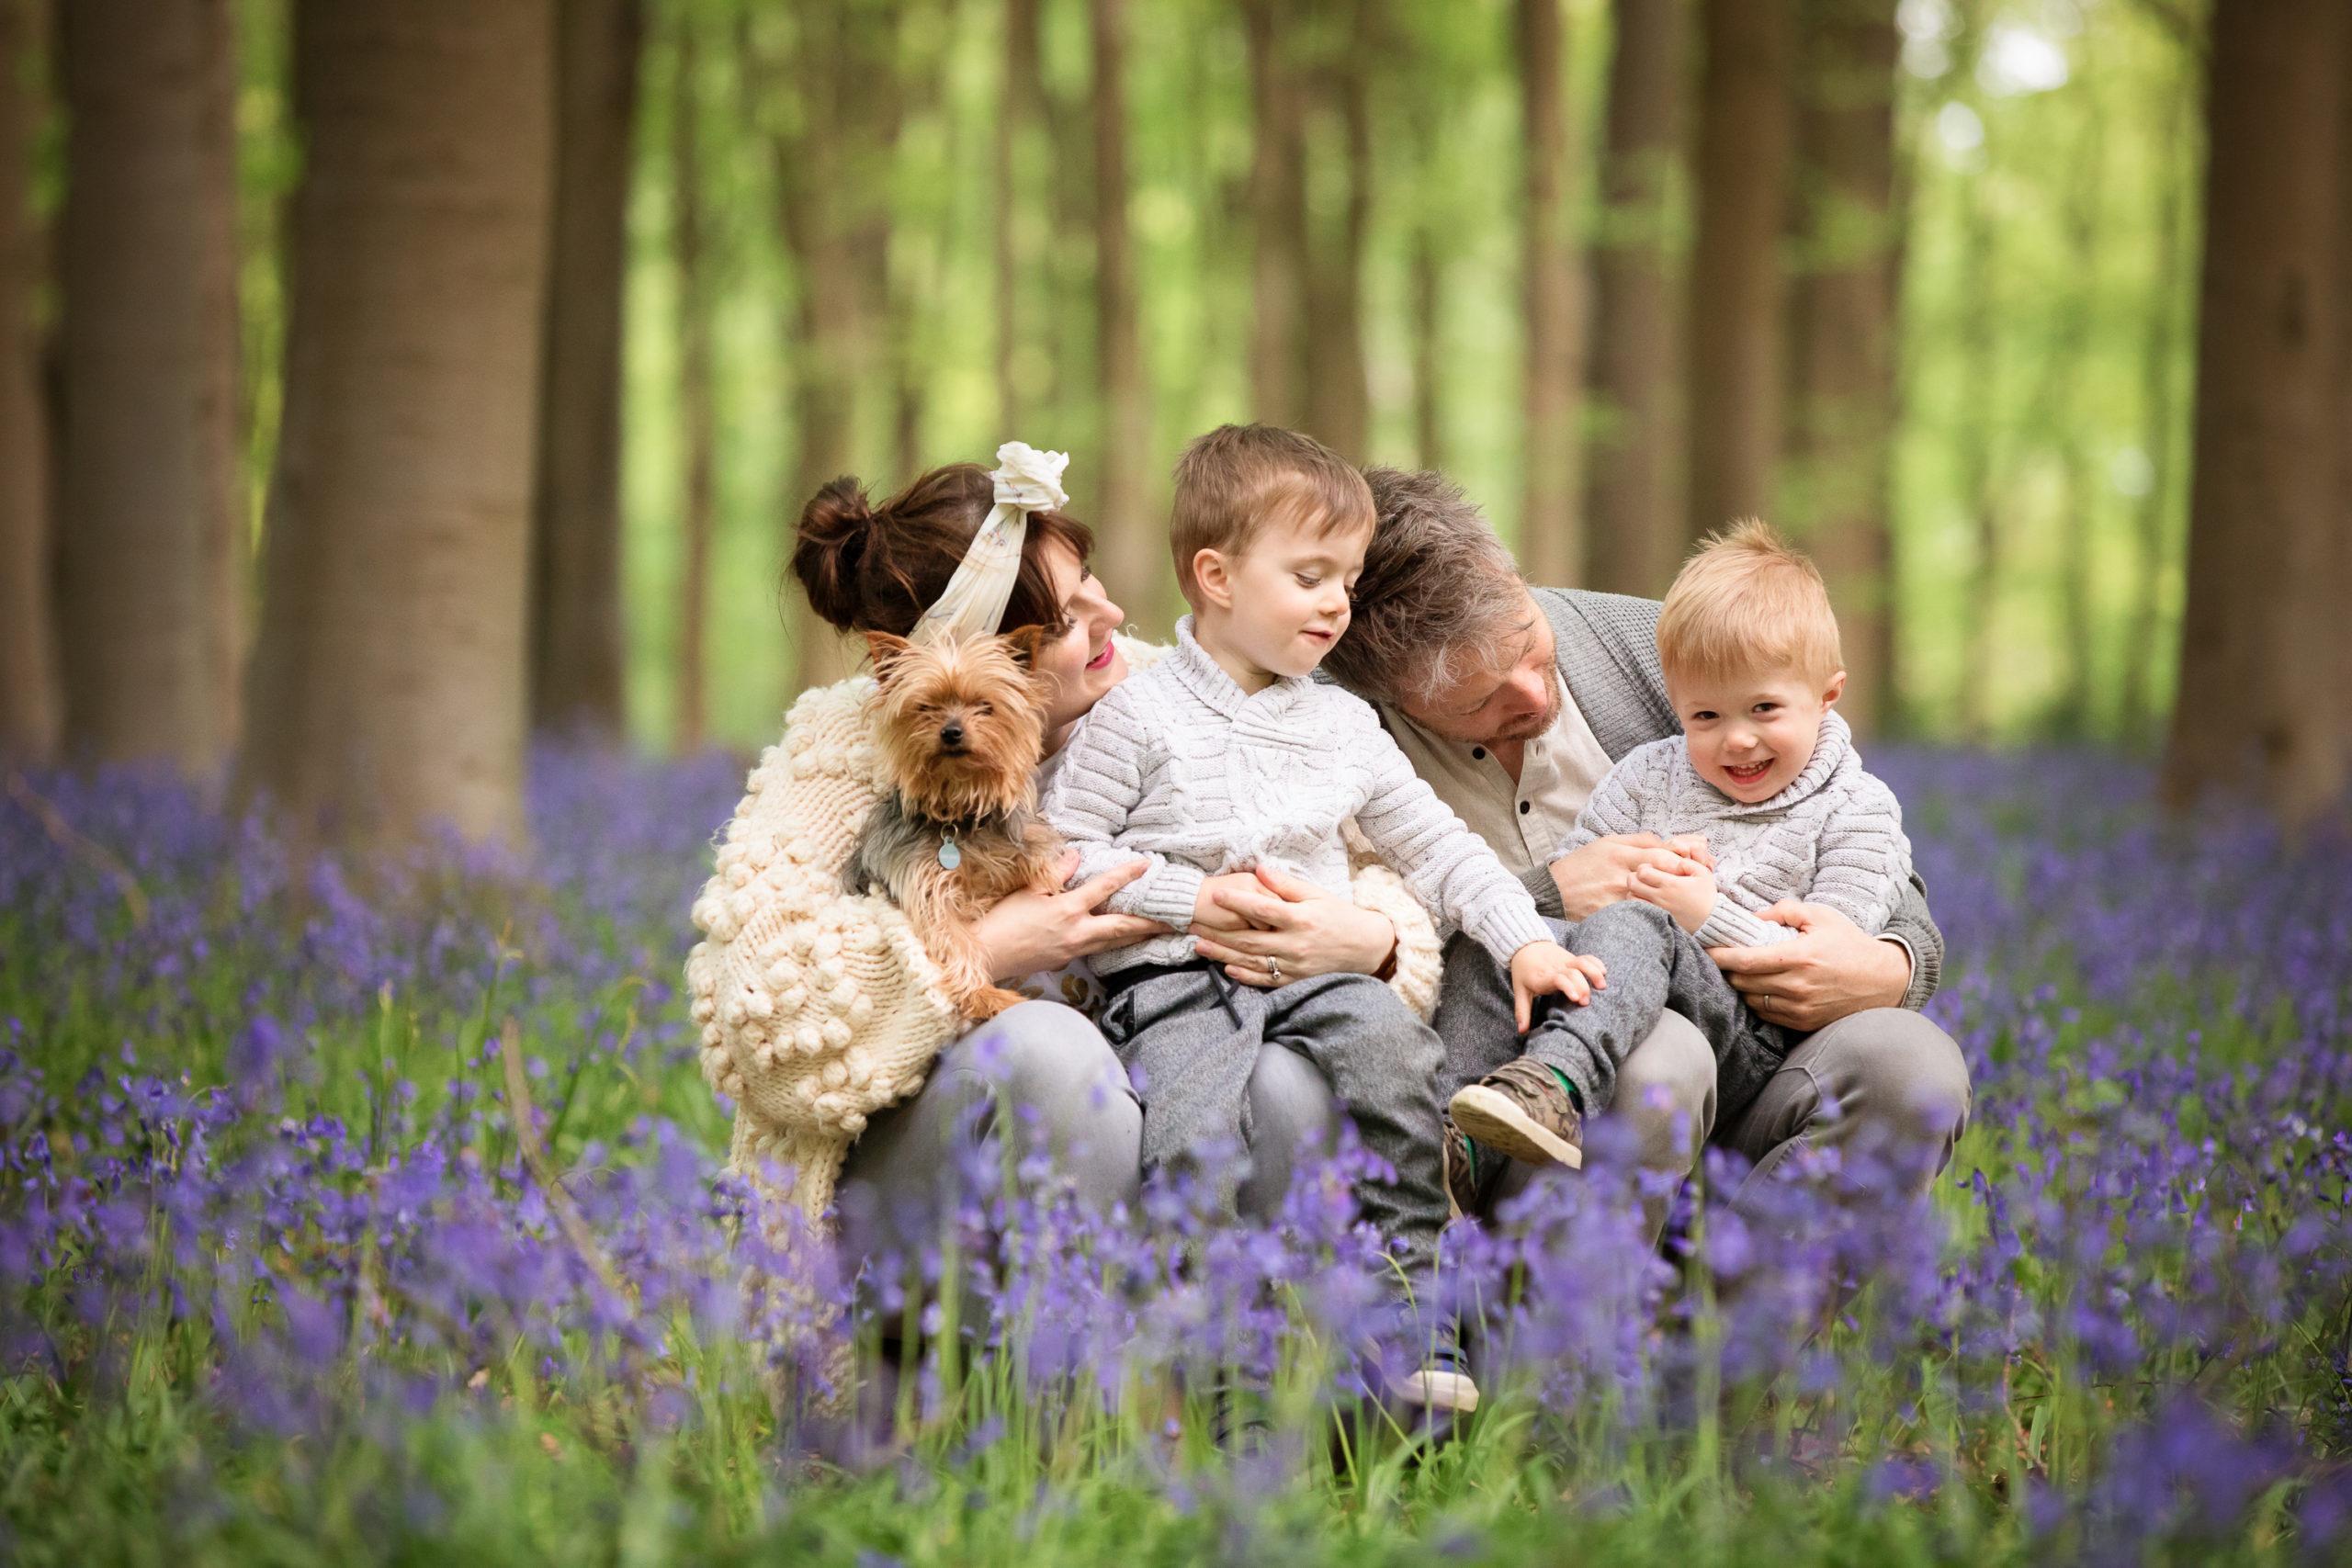 family photographer fleet, photographer fleet hampshire, bluebell photographer fleet hampshire, photographer hampshire, photographer surrey